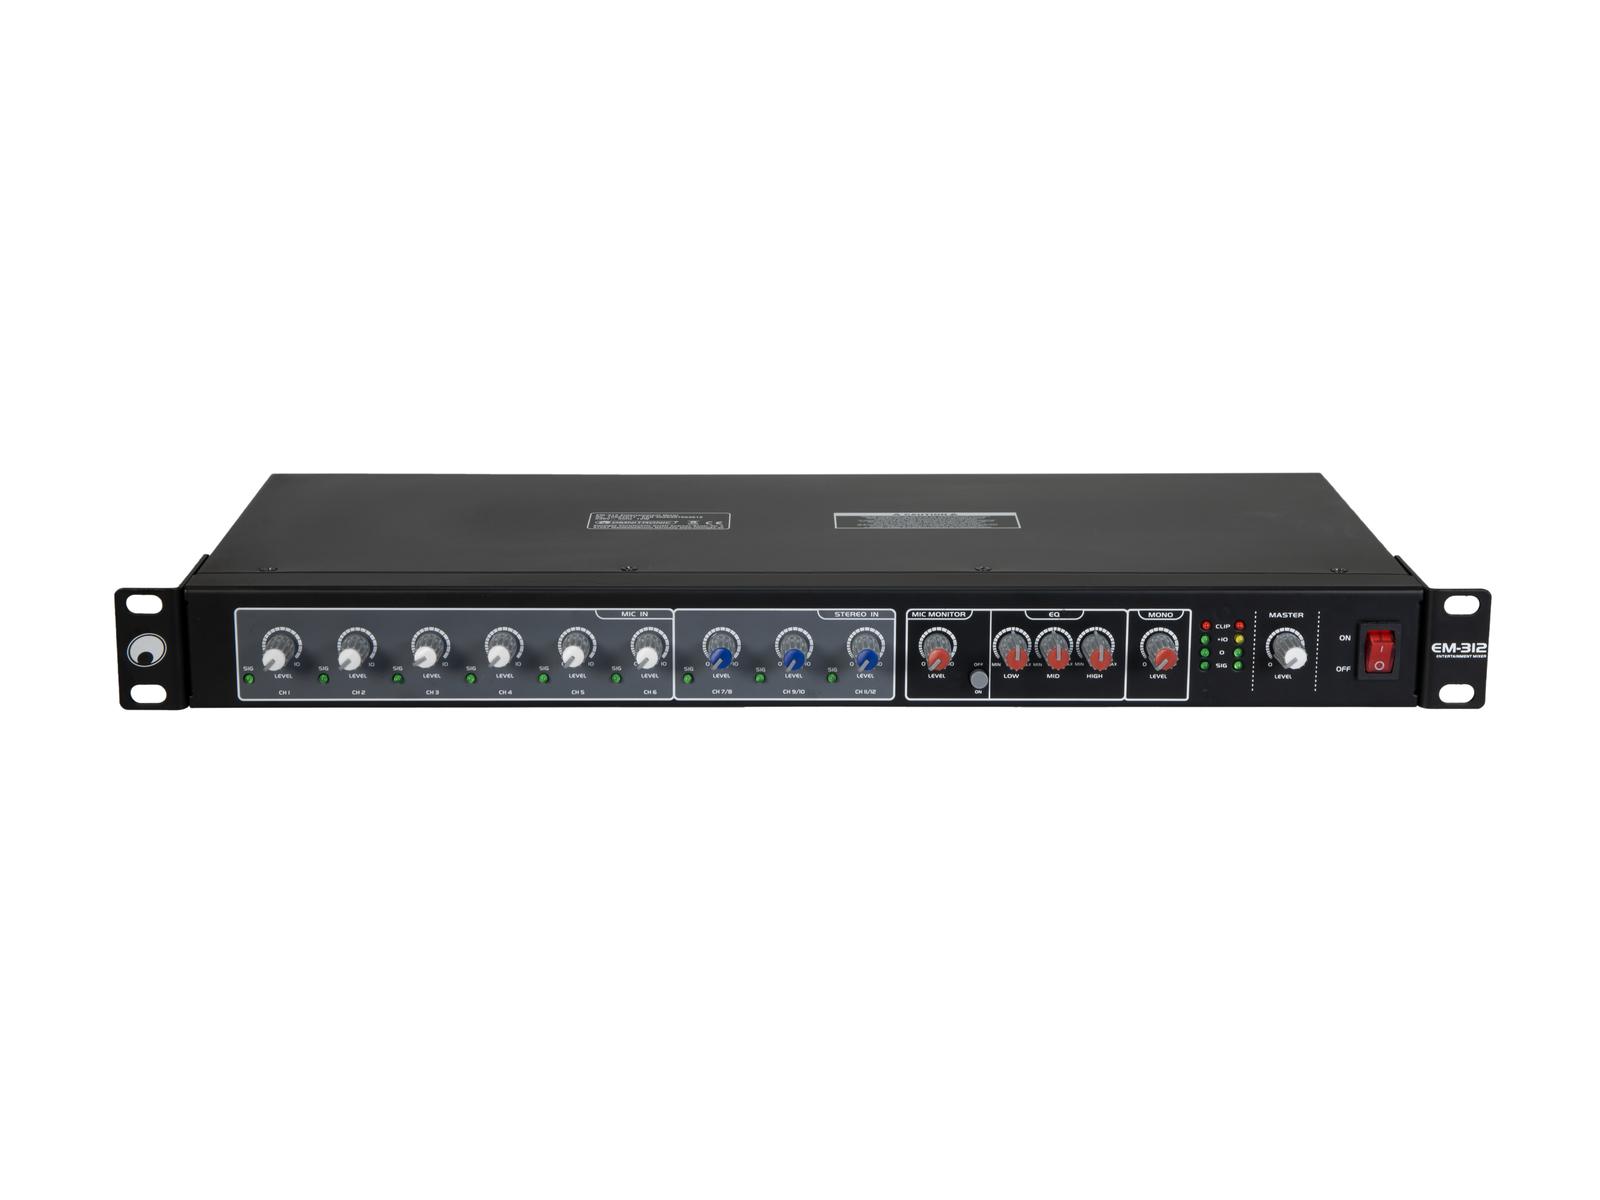 OMNITRONIC EM-312 Entertainment-Mixer